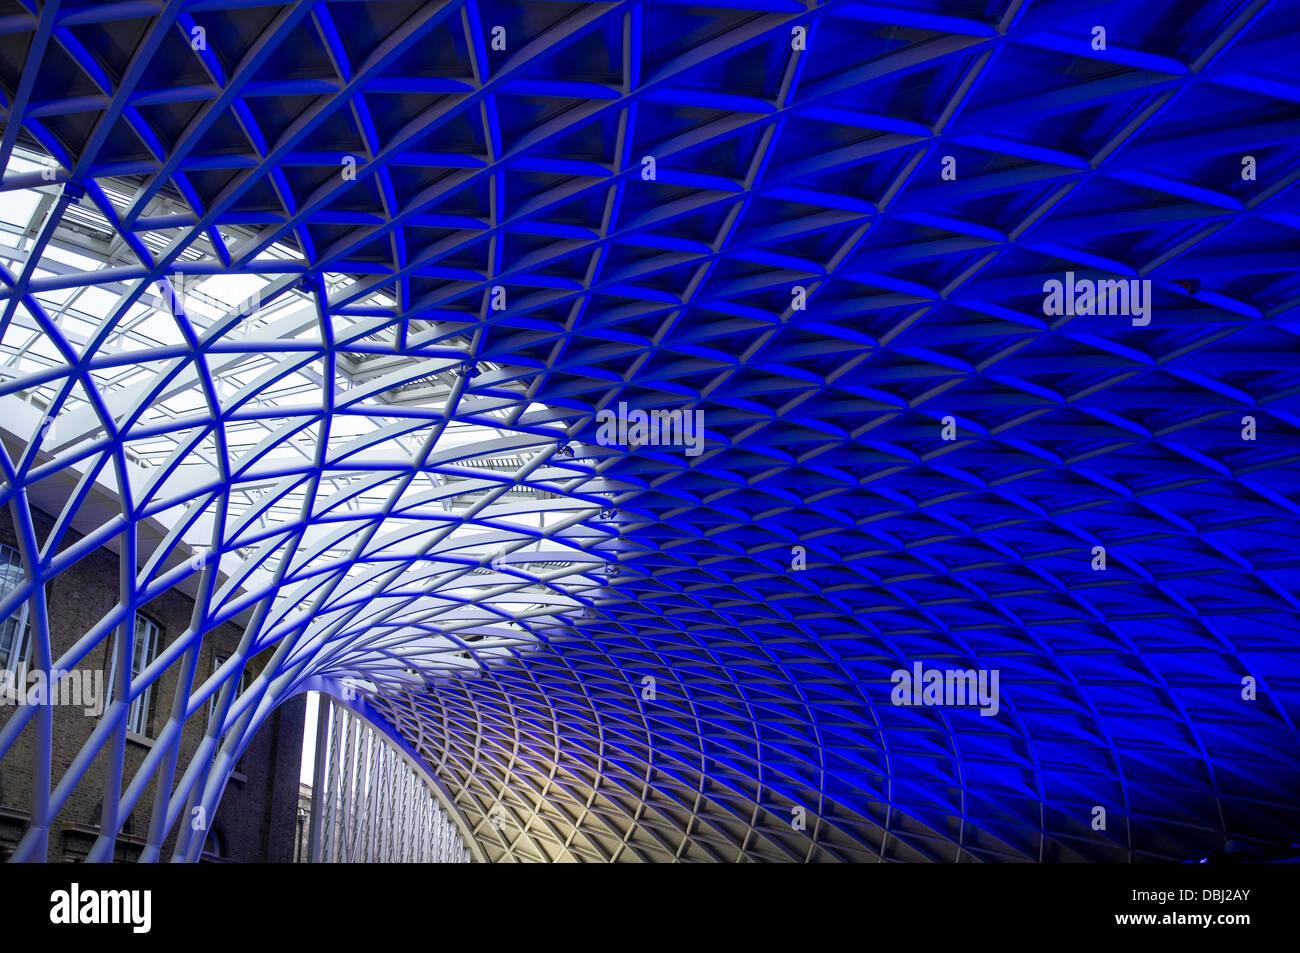 Kings Cross modern architecture - Stock Image